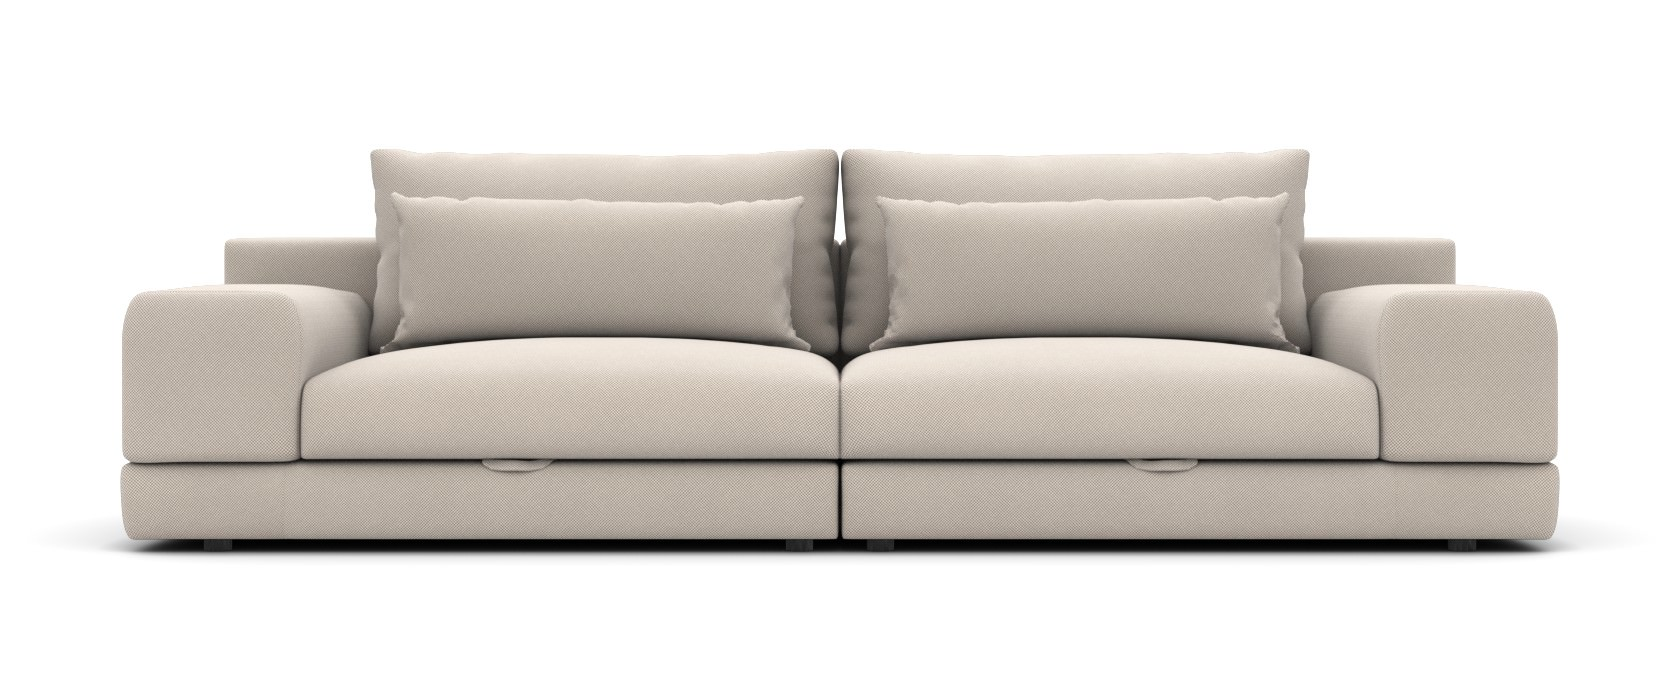 Трехместный диван Dario - Pufetto